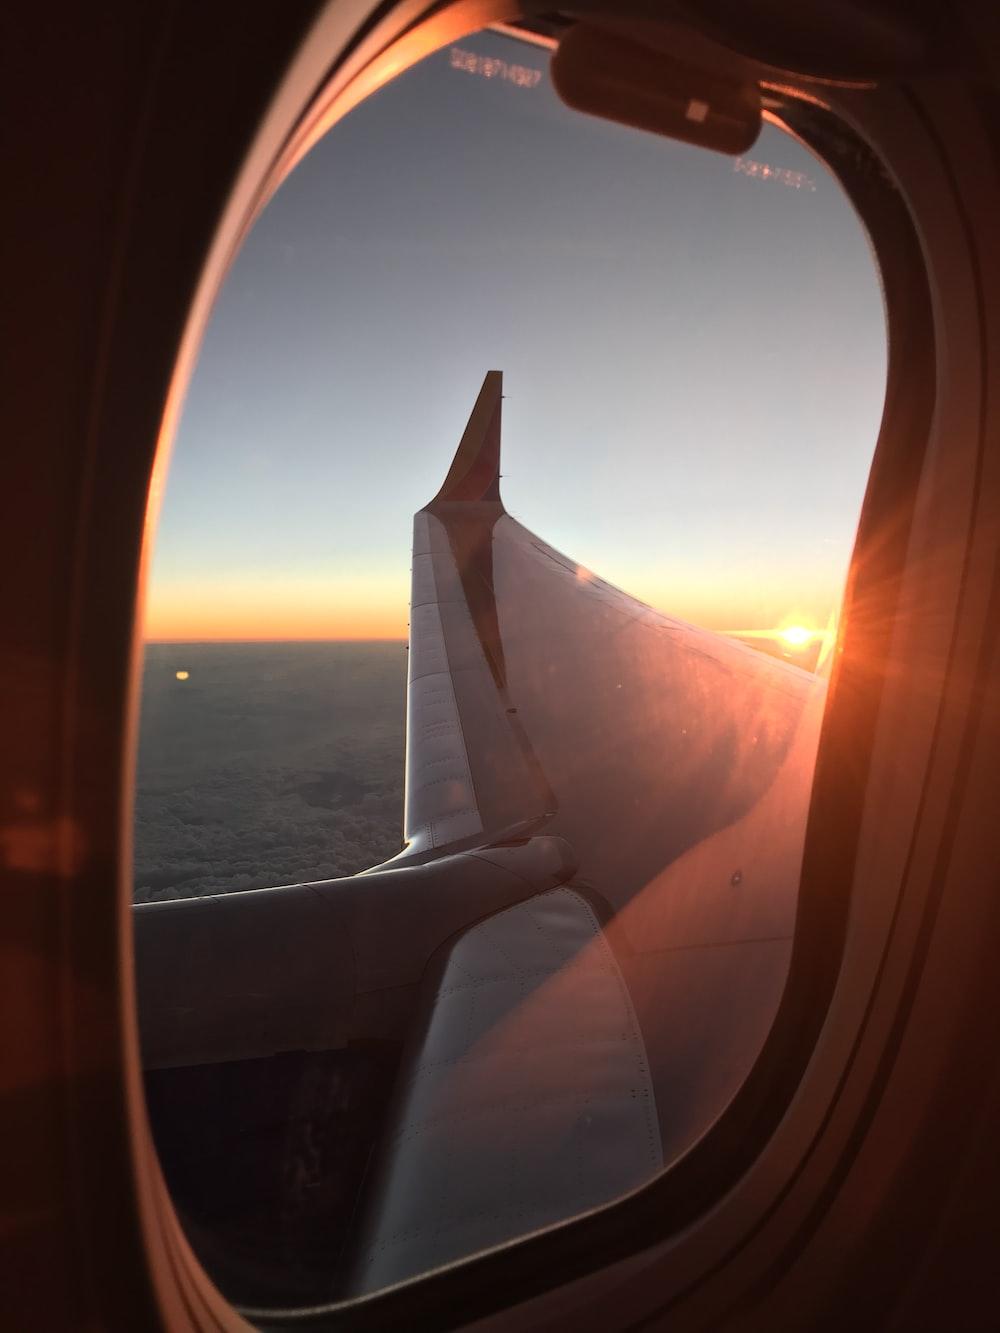 gray airplane window during daytime